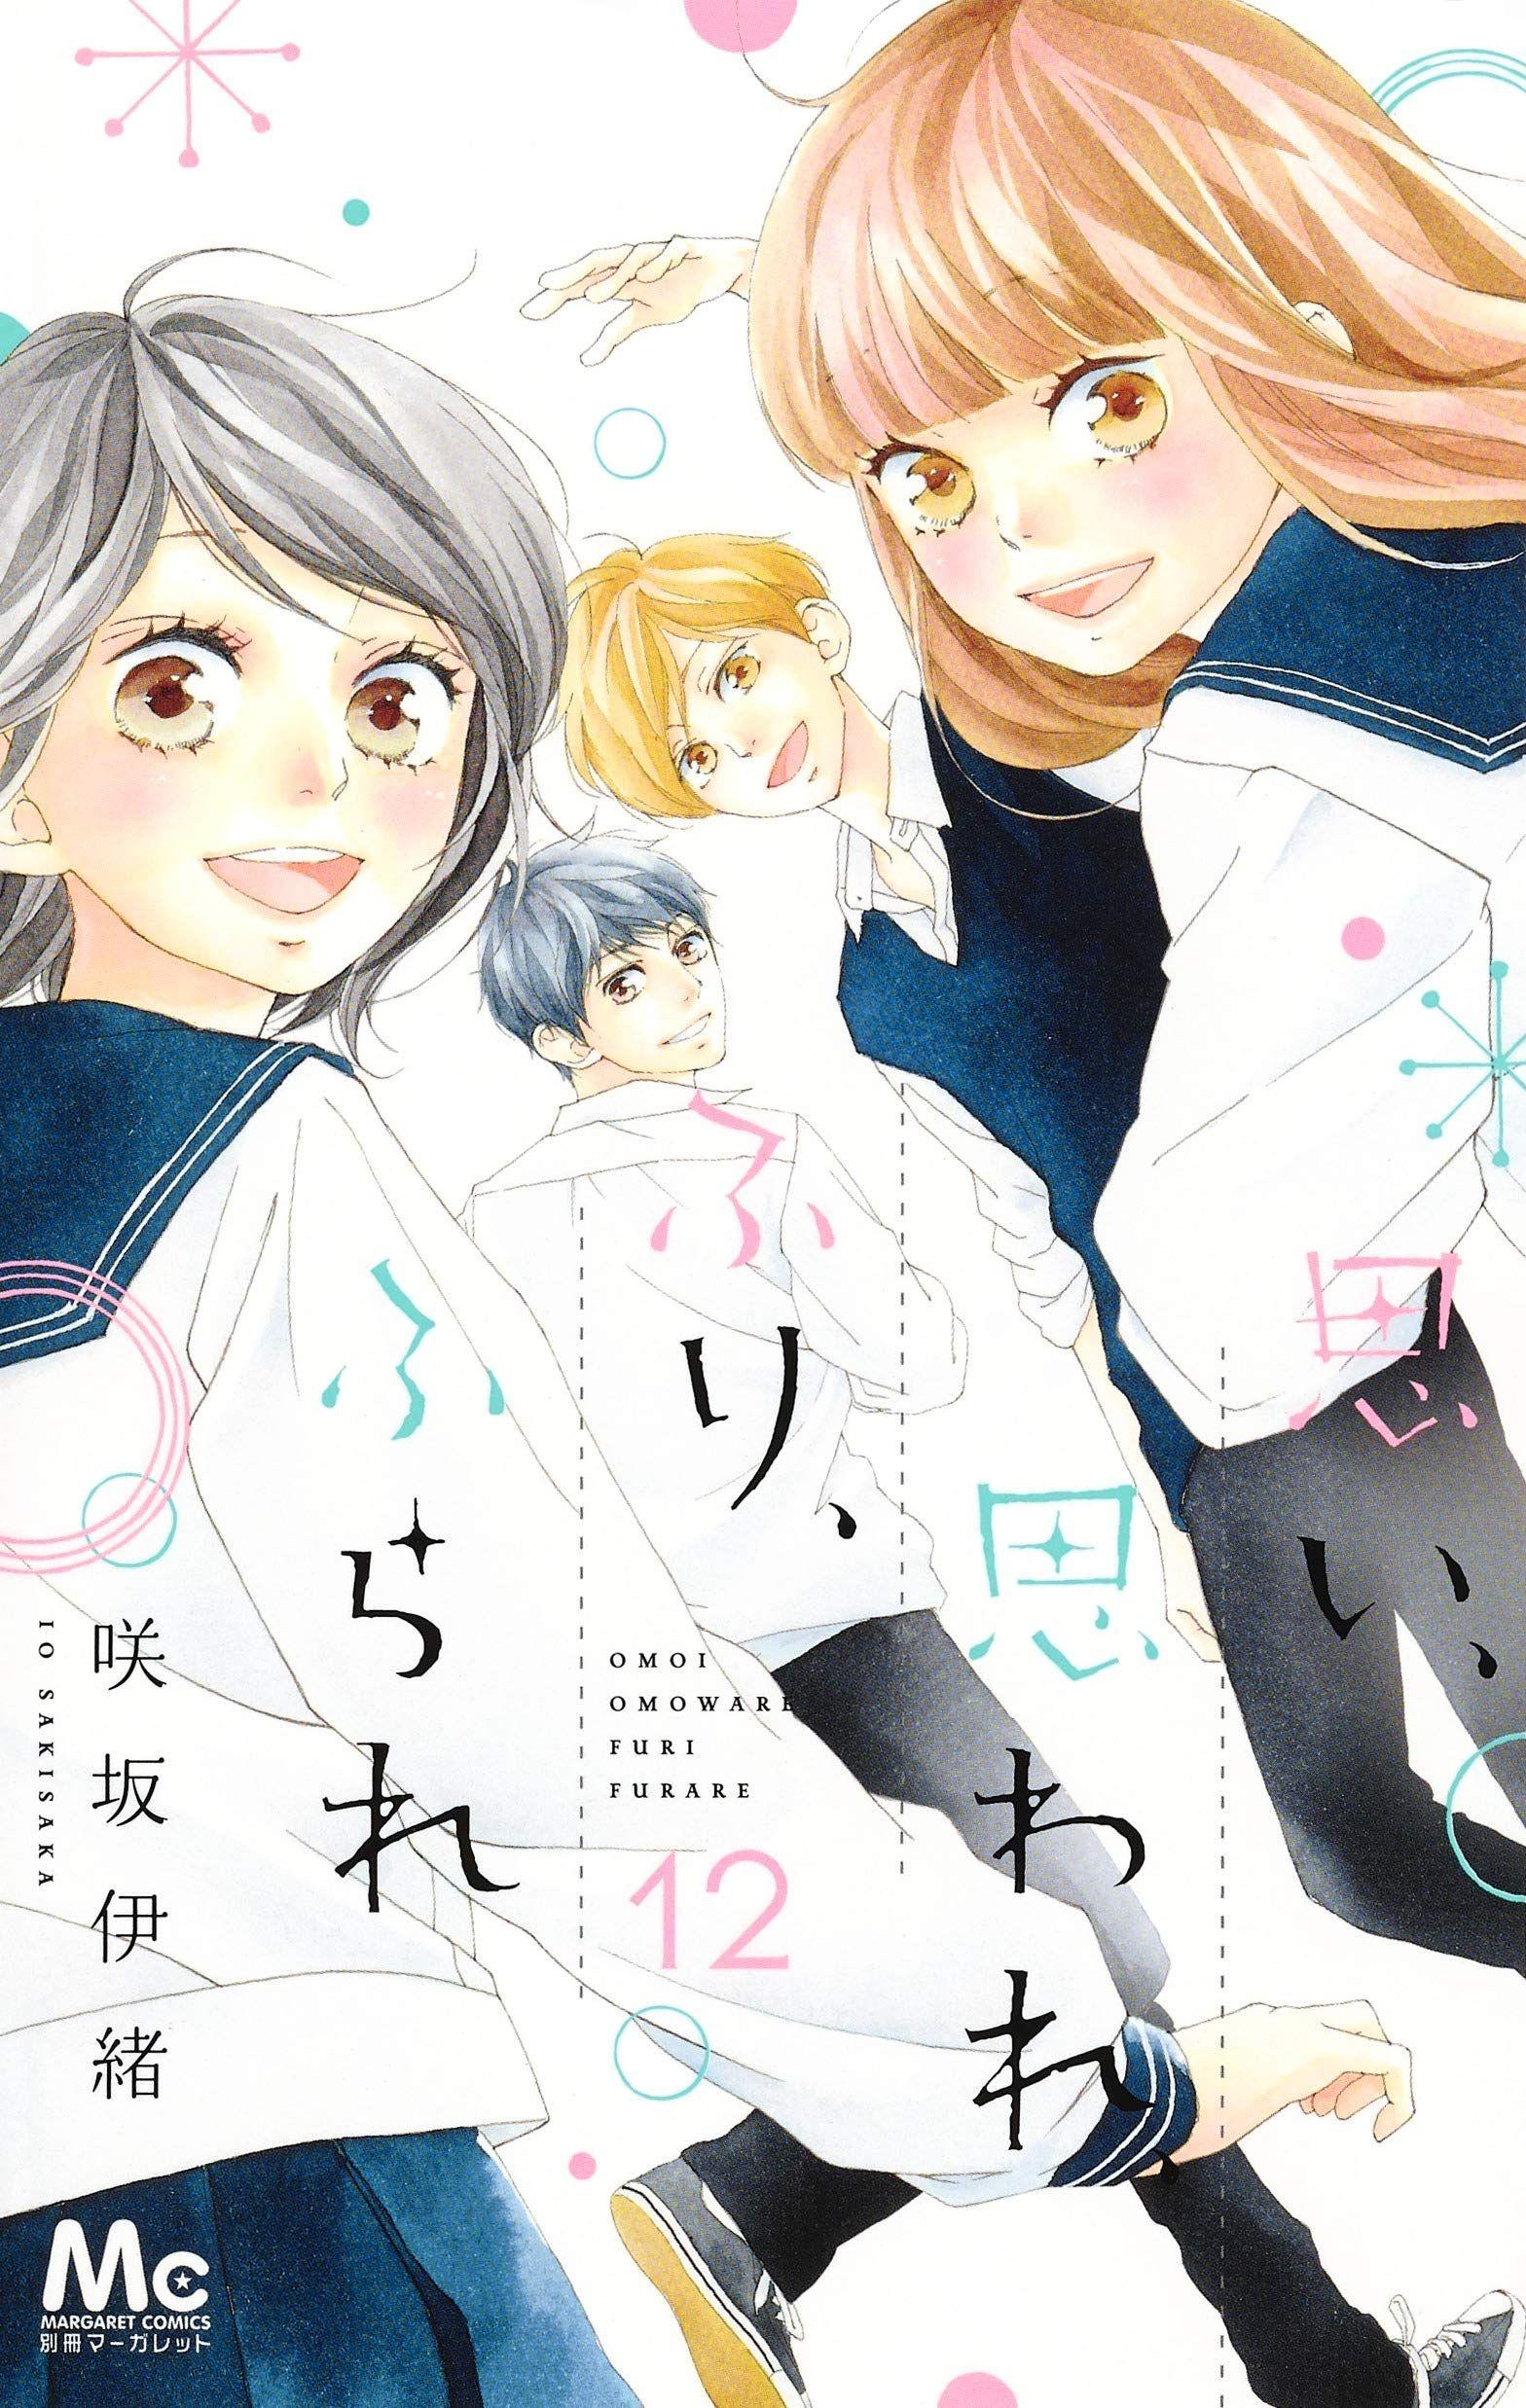 Manga - Manhwa - Omoi, omoware, furi, furare jp Vol.12